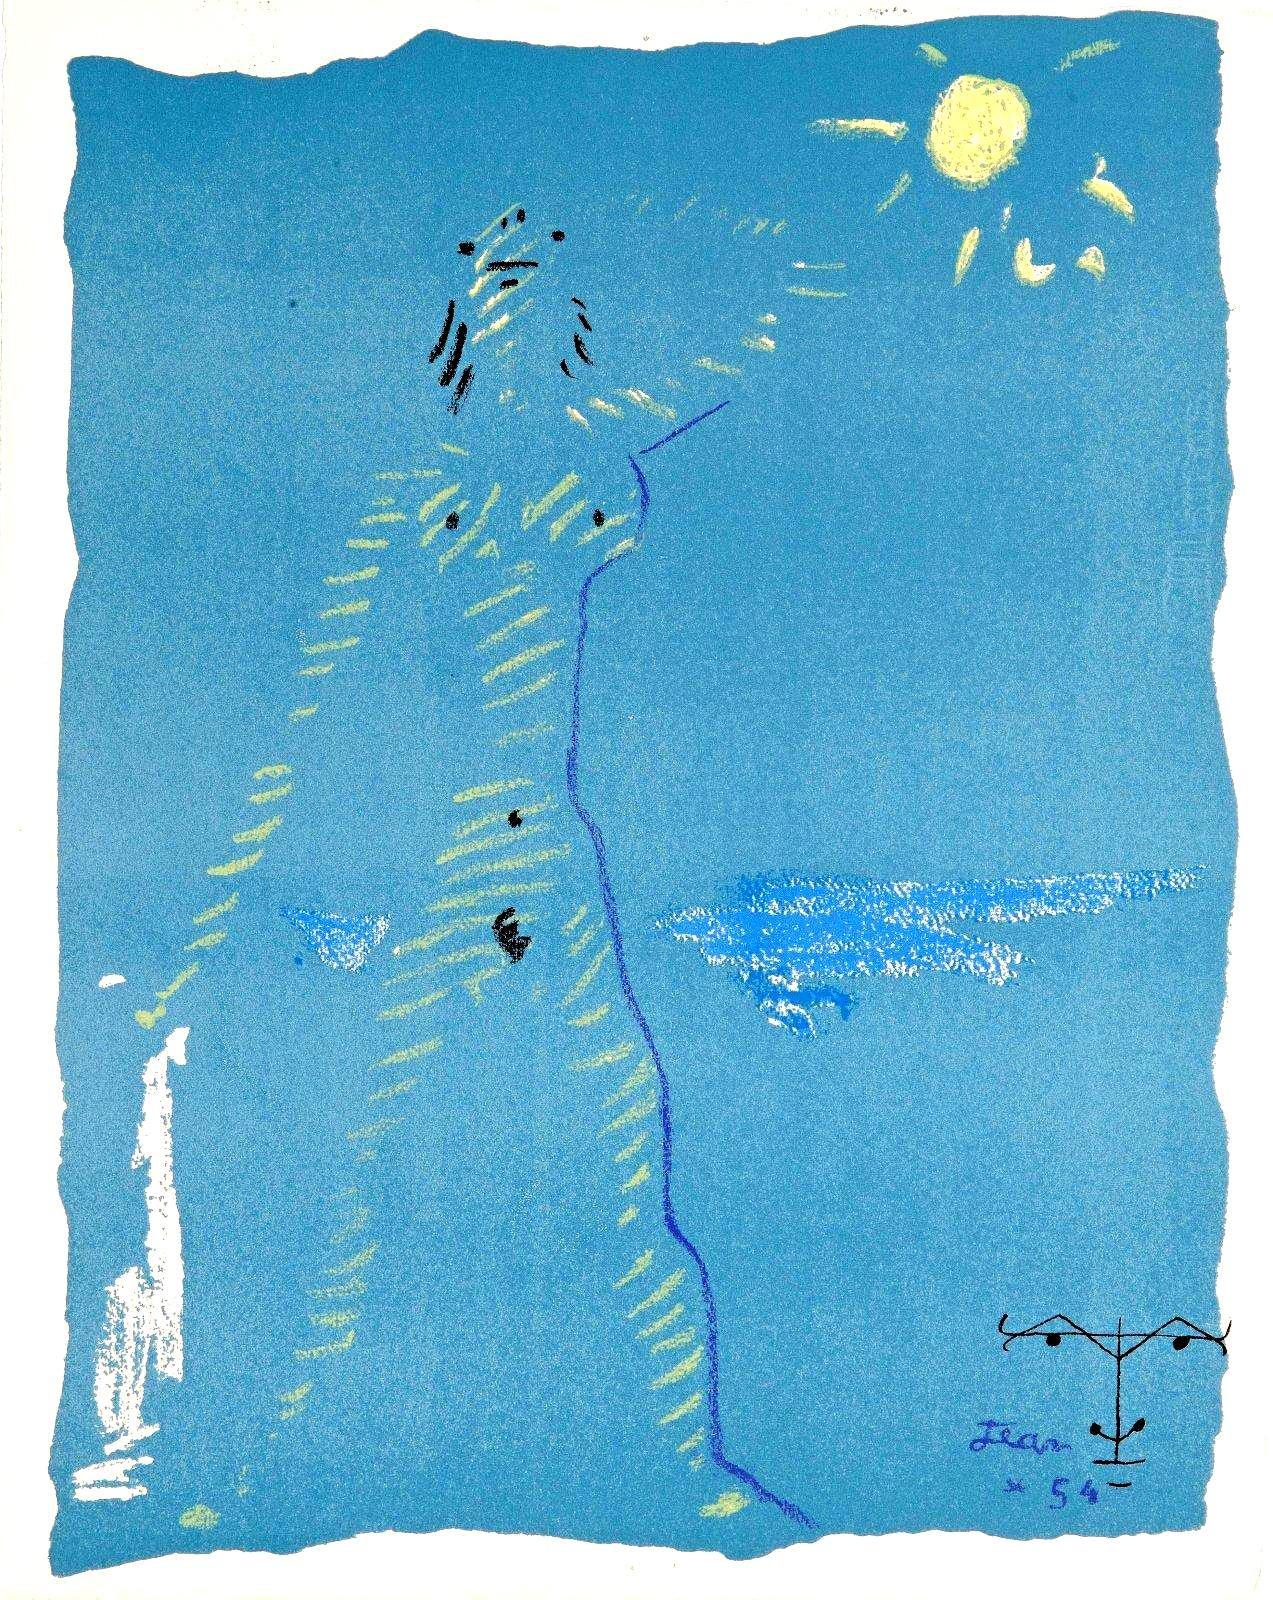 Jean Cocteau - Under the Fire Coat - Original Lithograph